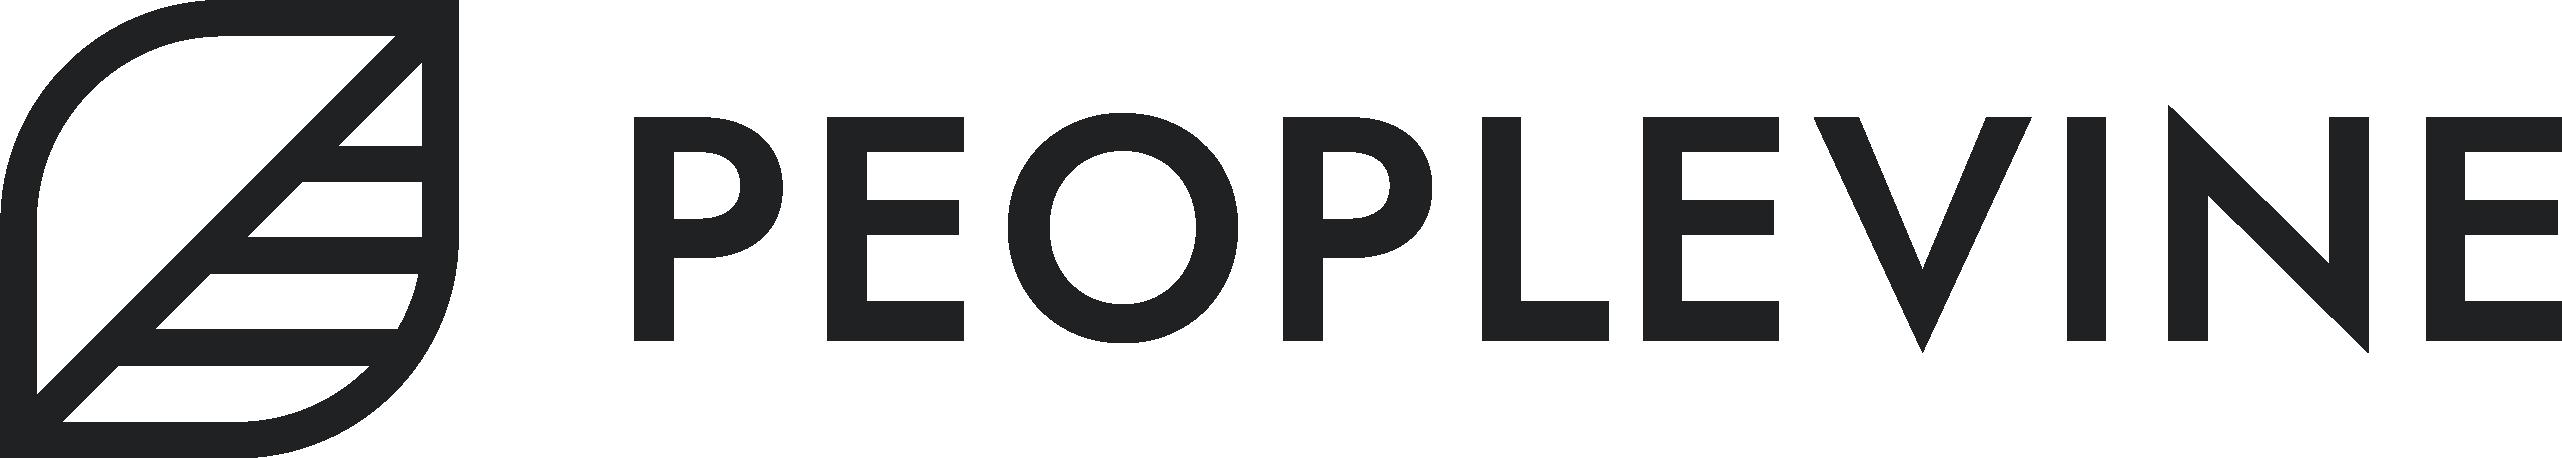 Peoplevine Logo